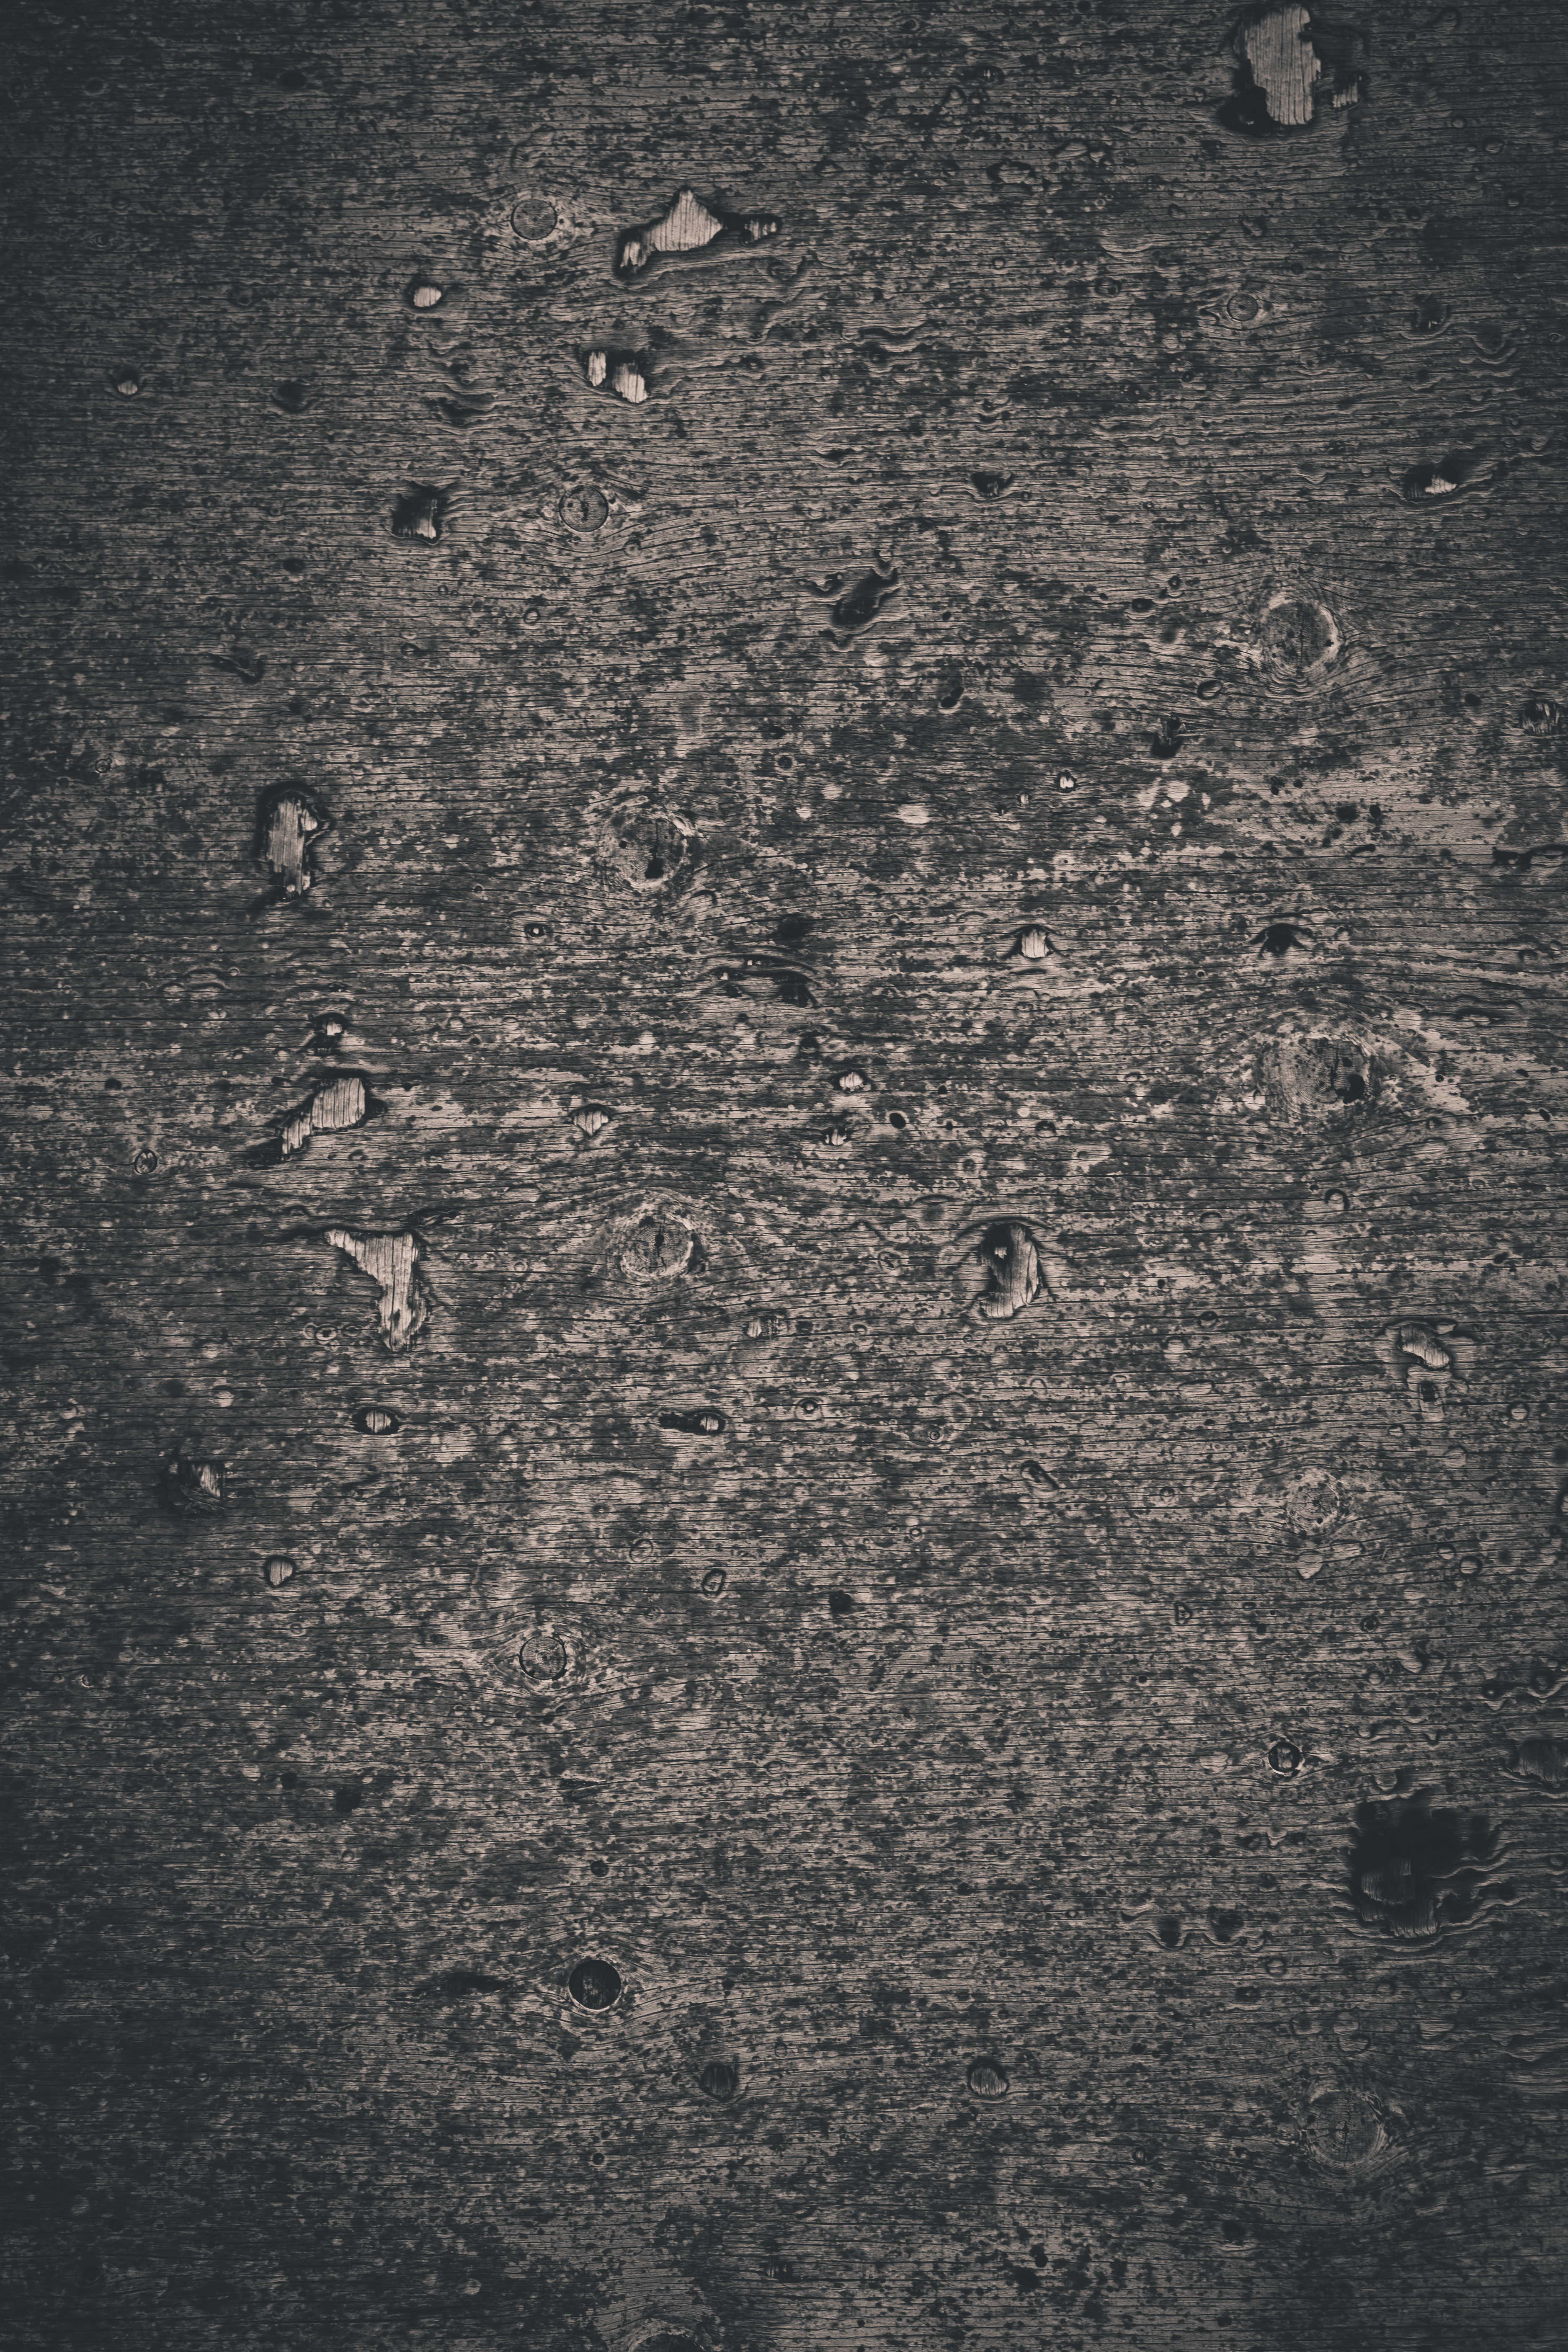 Grunge Wood Texture, Black, Blackandwhite, Grunge, Old, HQ Photo